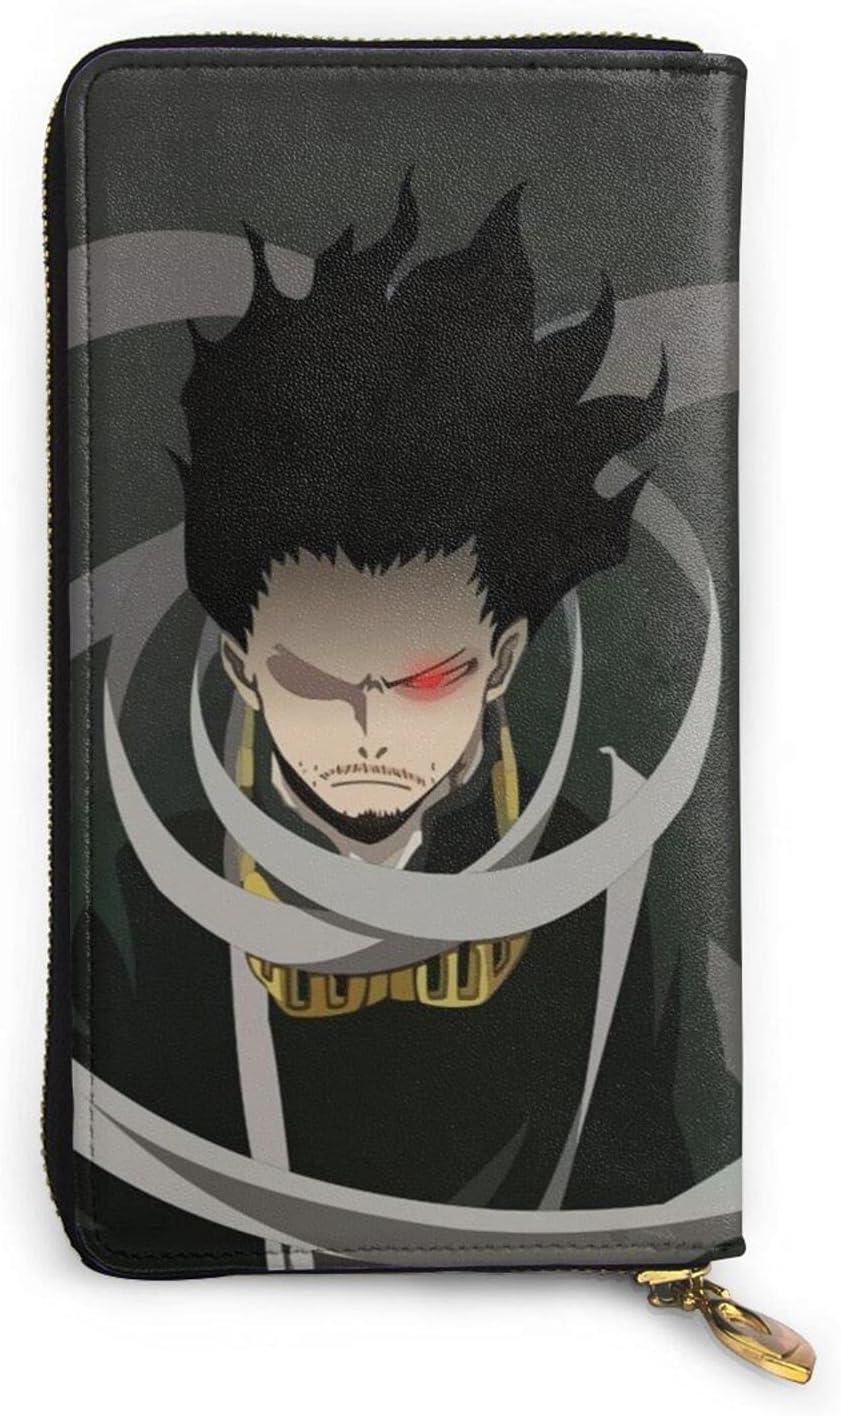 My Hero Academia Shota Aizawa Leather Cartoon Zip Max 79% OFF Anime Overseas parallel import regular item Wallet P